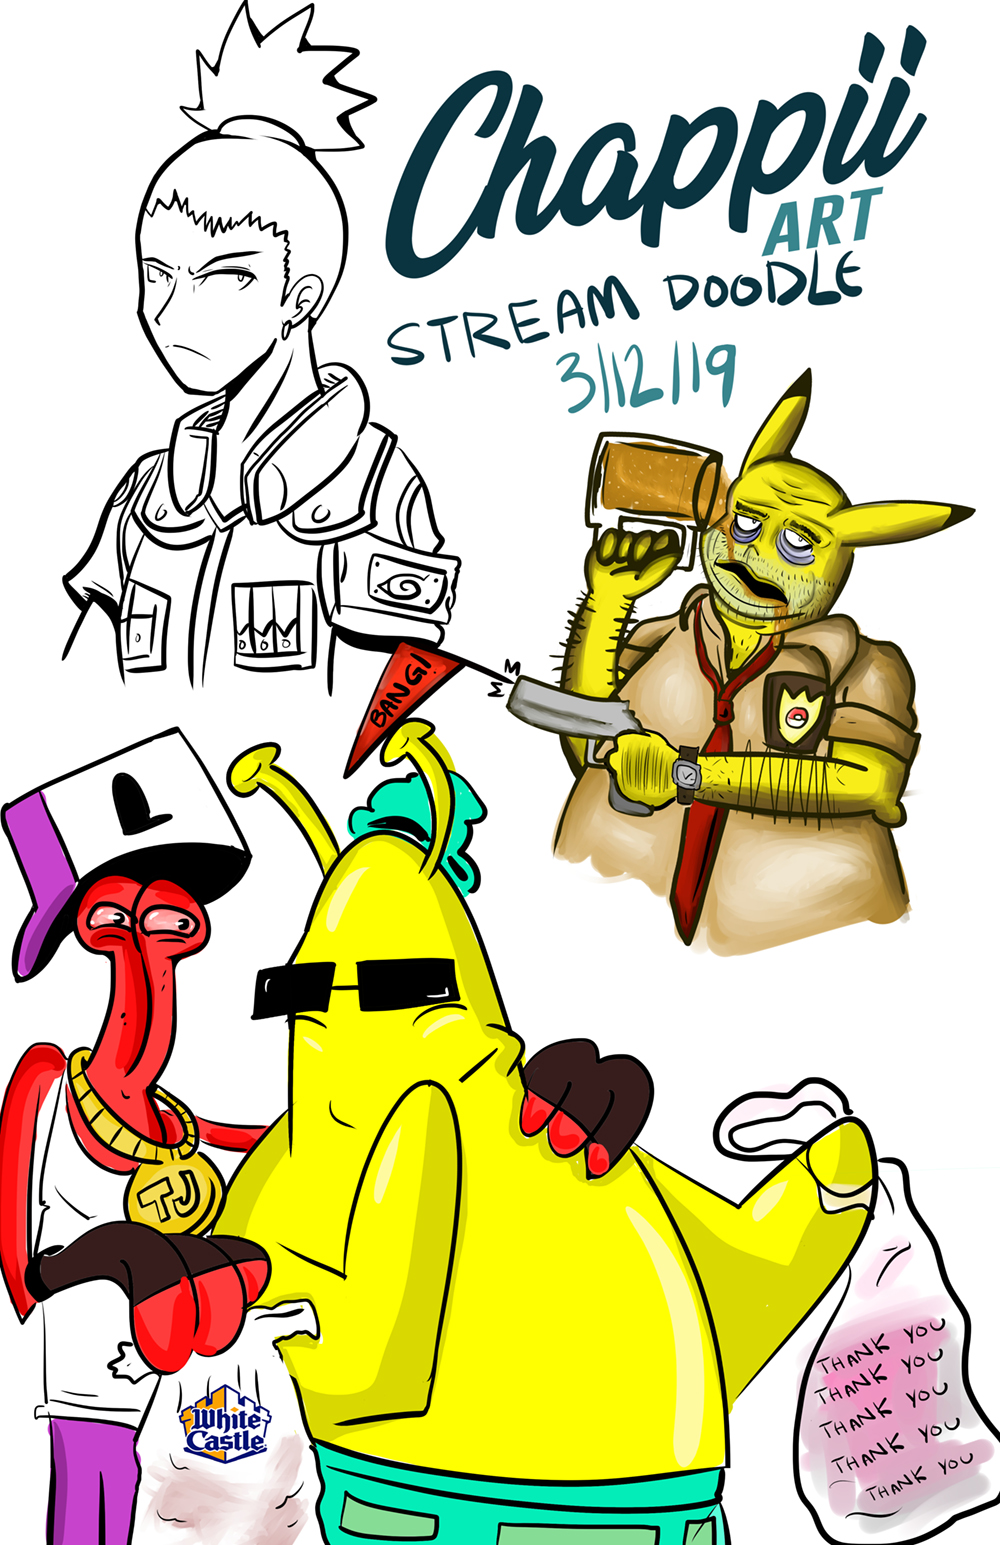 Stream Doodles 3-12-19